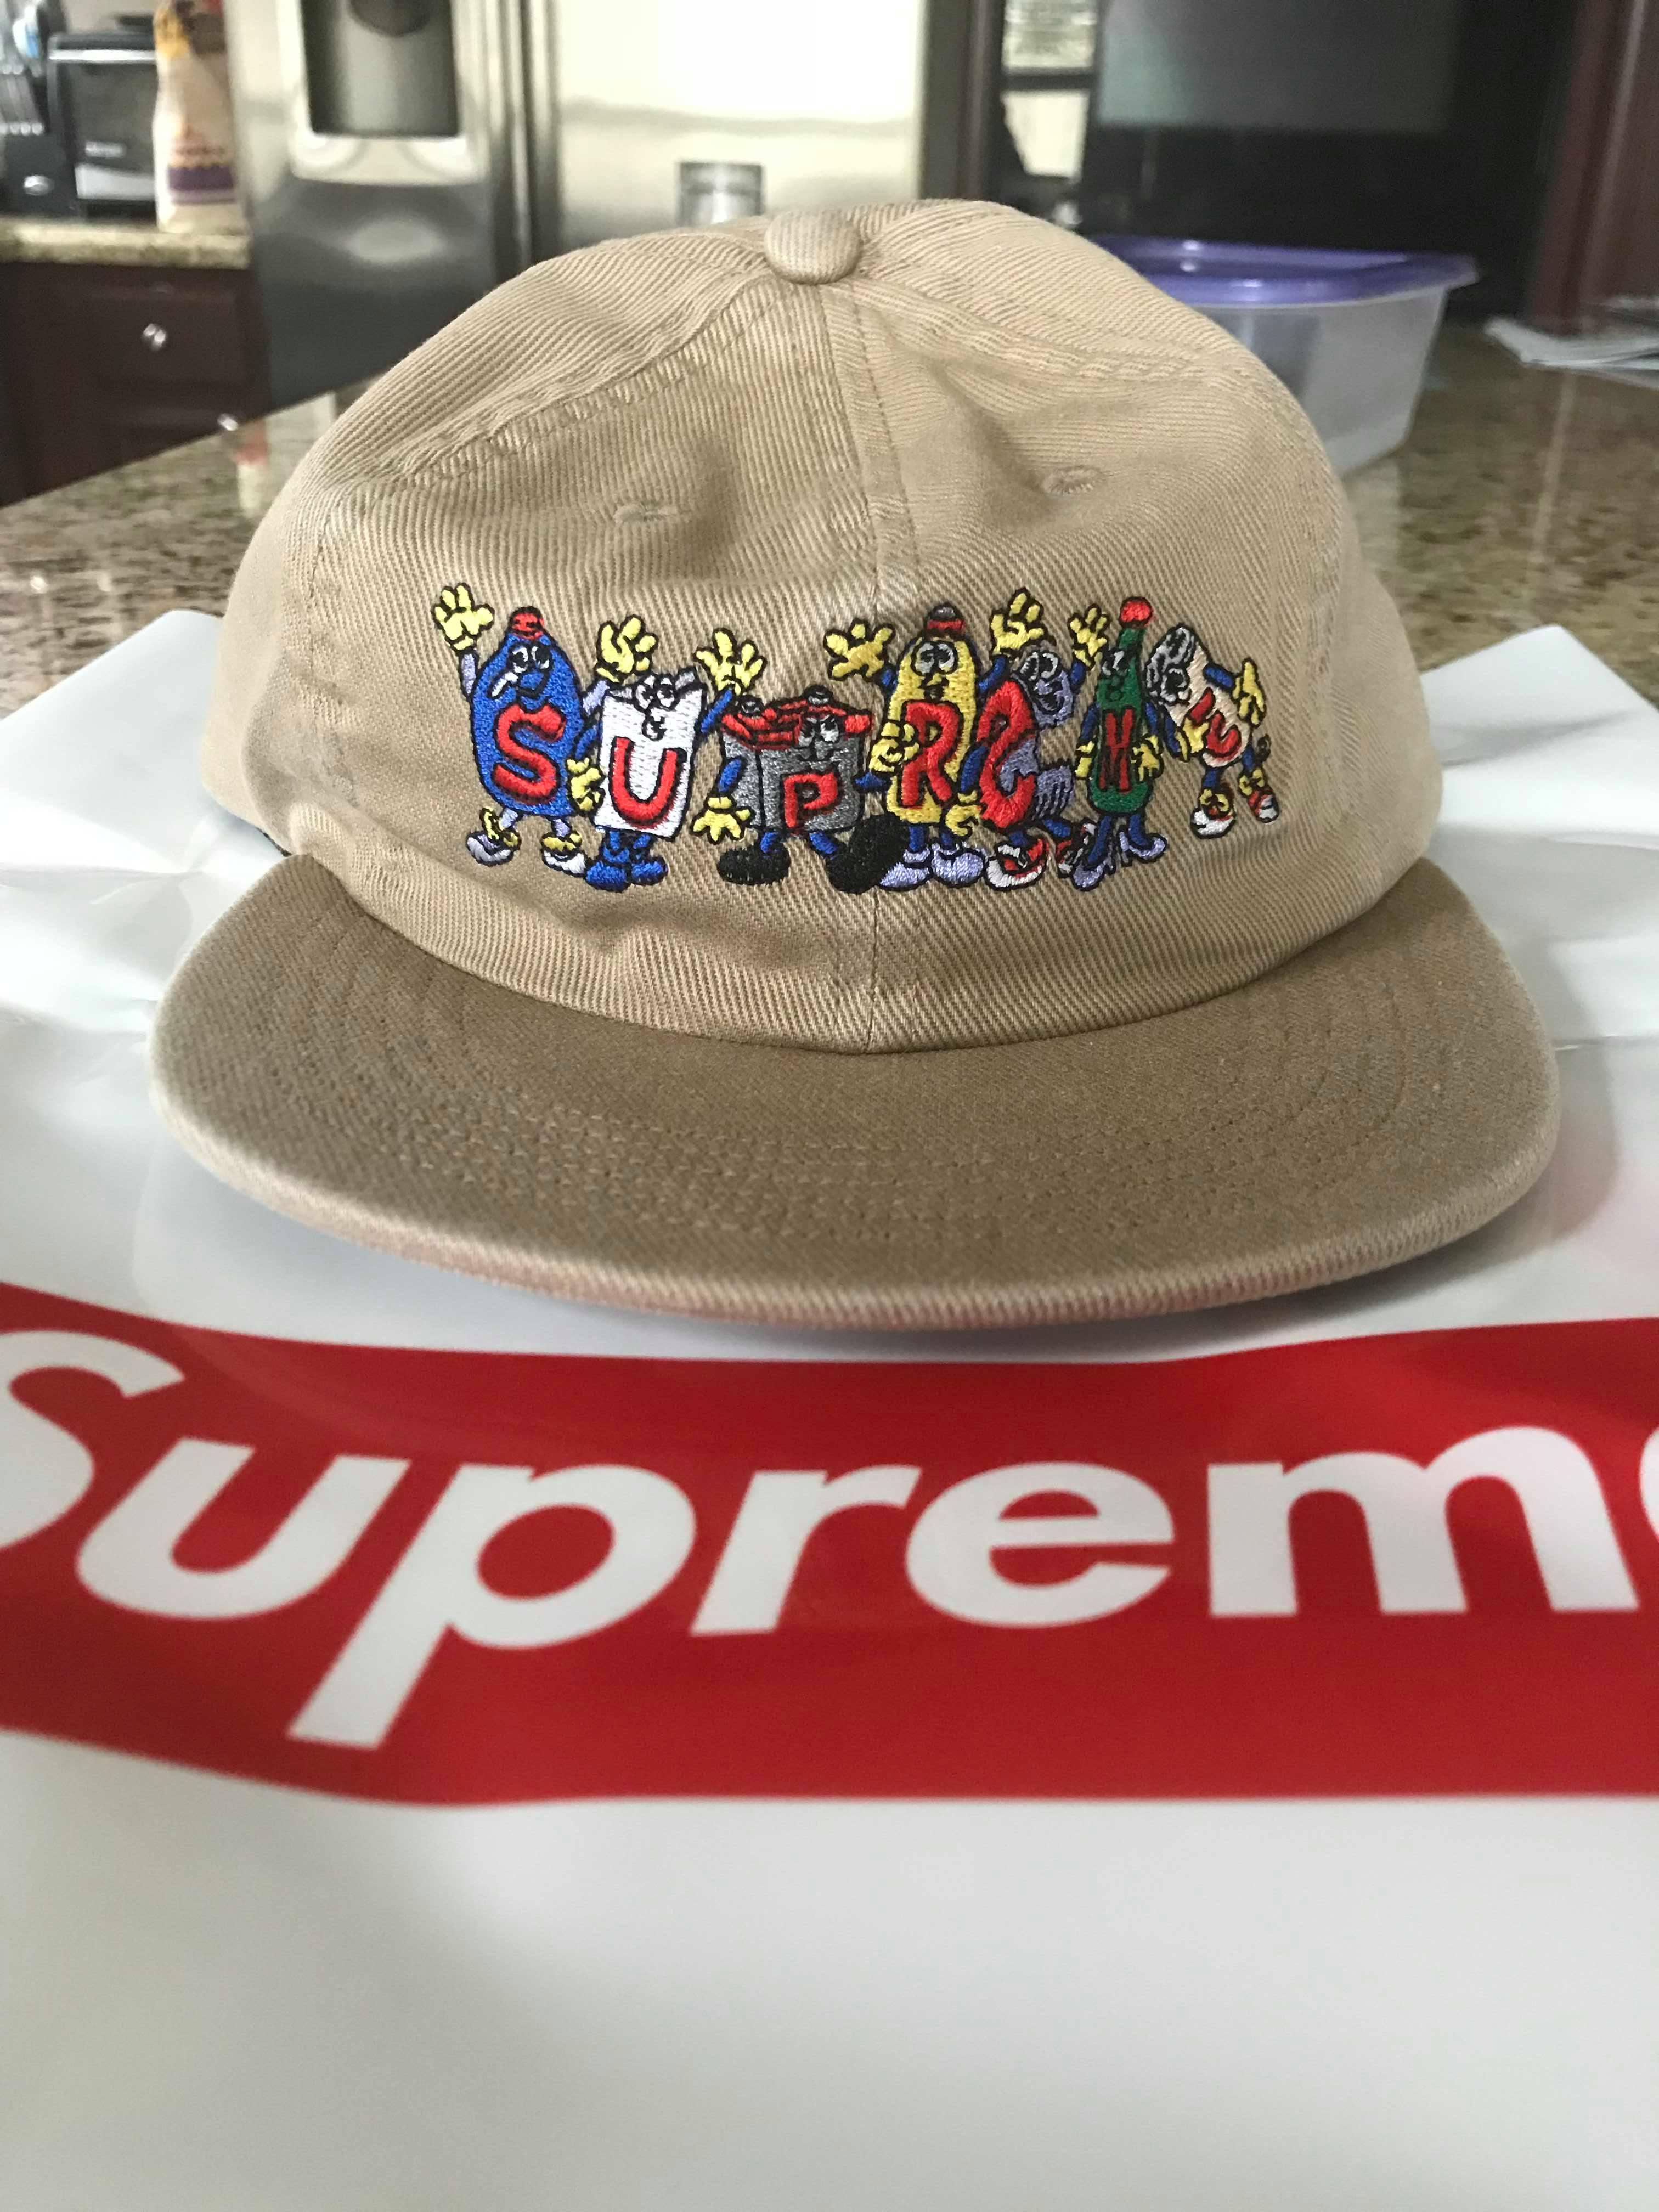 5d4756a4e76 Supreme Supreme Friends 6-Panel Khaki Size one size - Hats for Sale -  Grailed